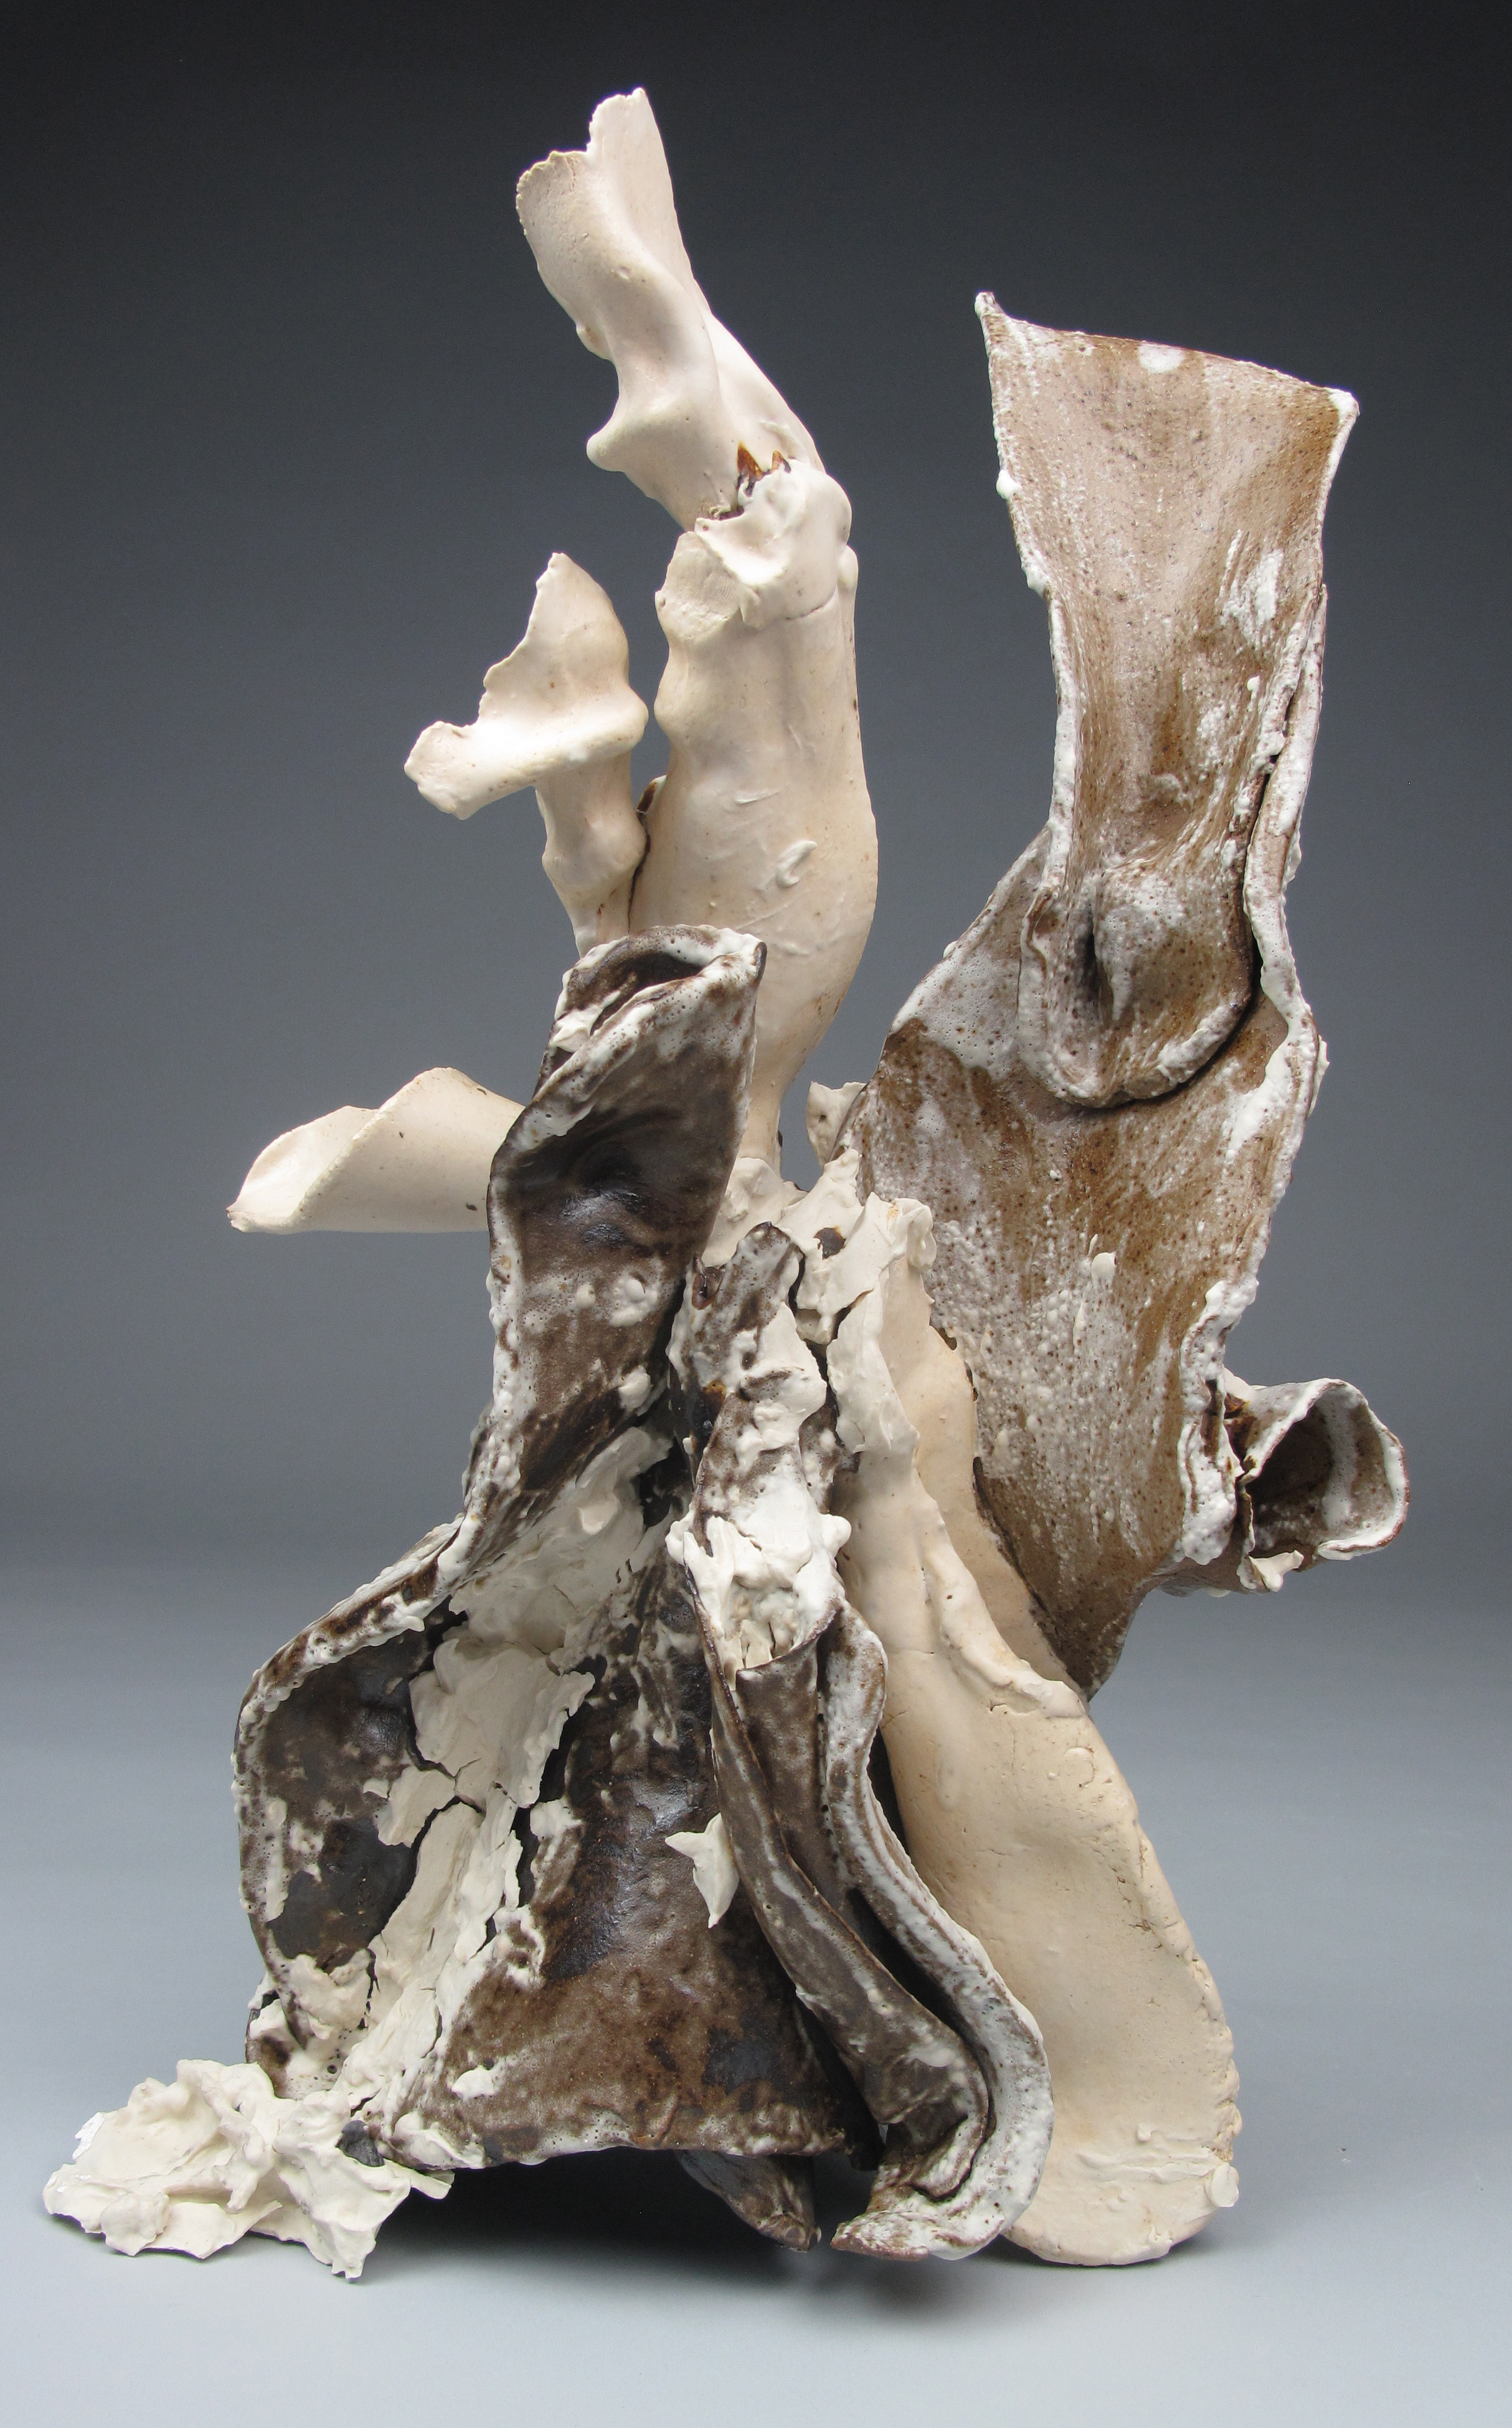 Sara Fine-Wilson,  Jagged , ceramic, 14x10x10